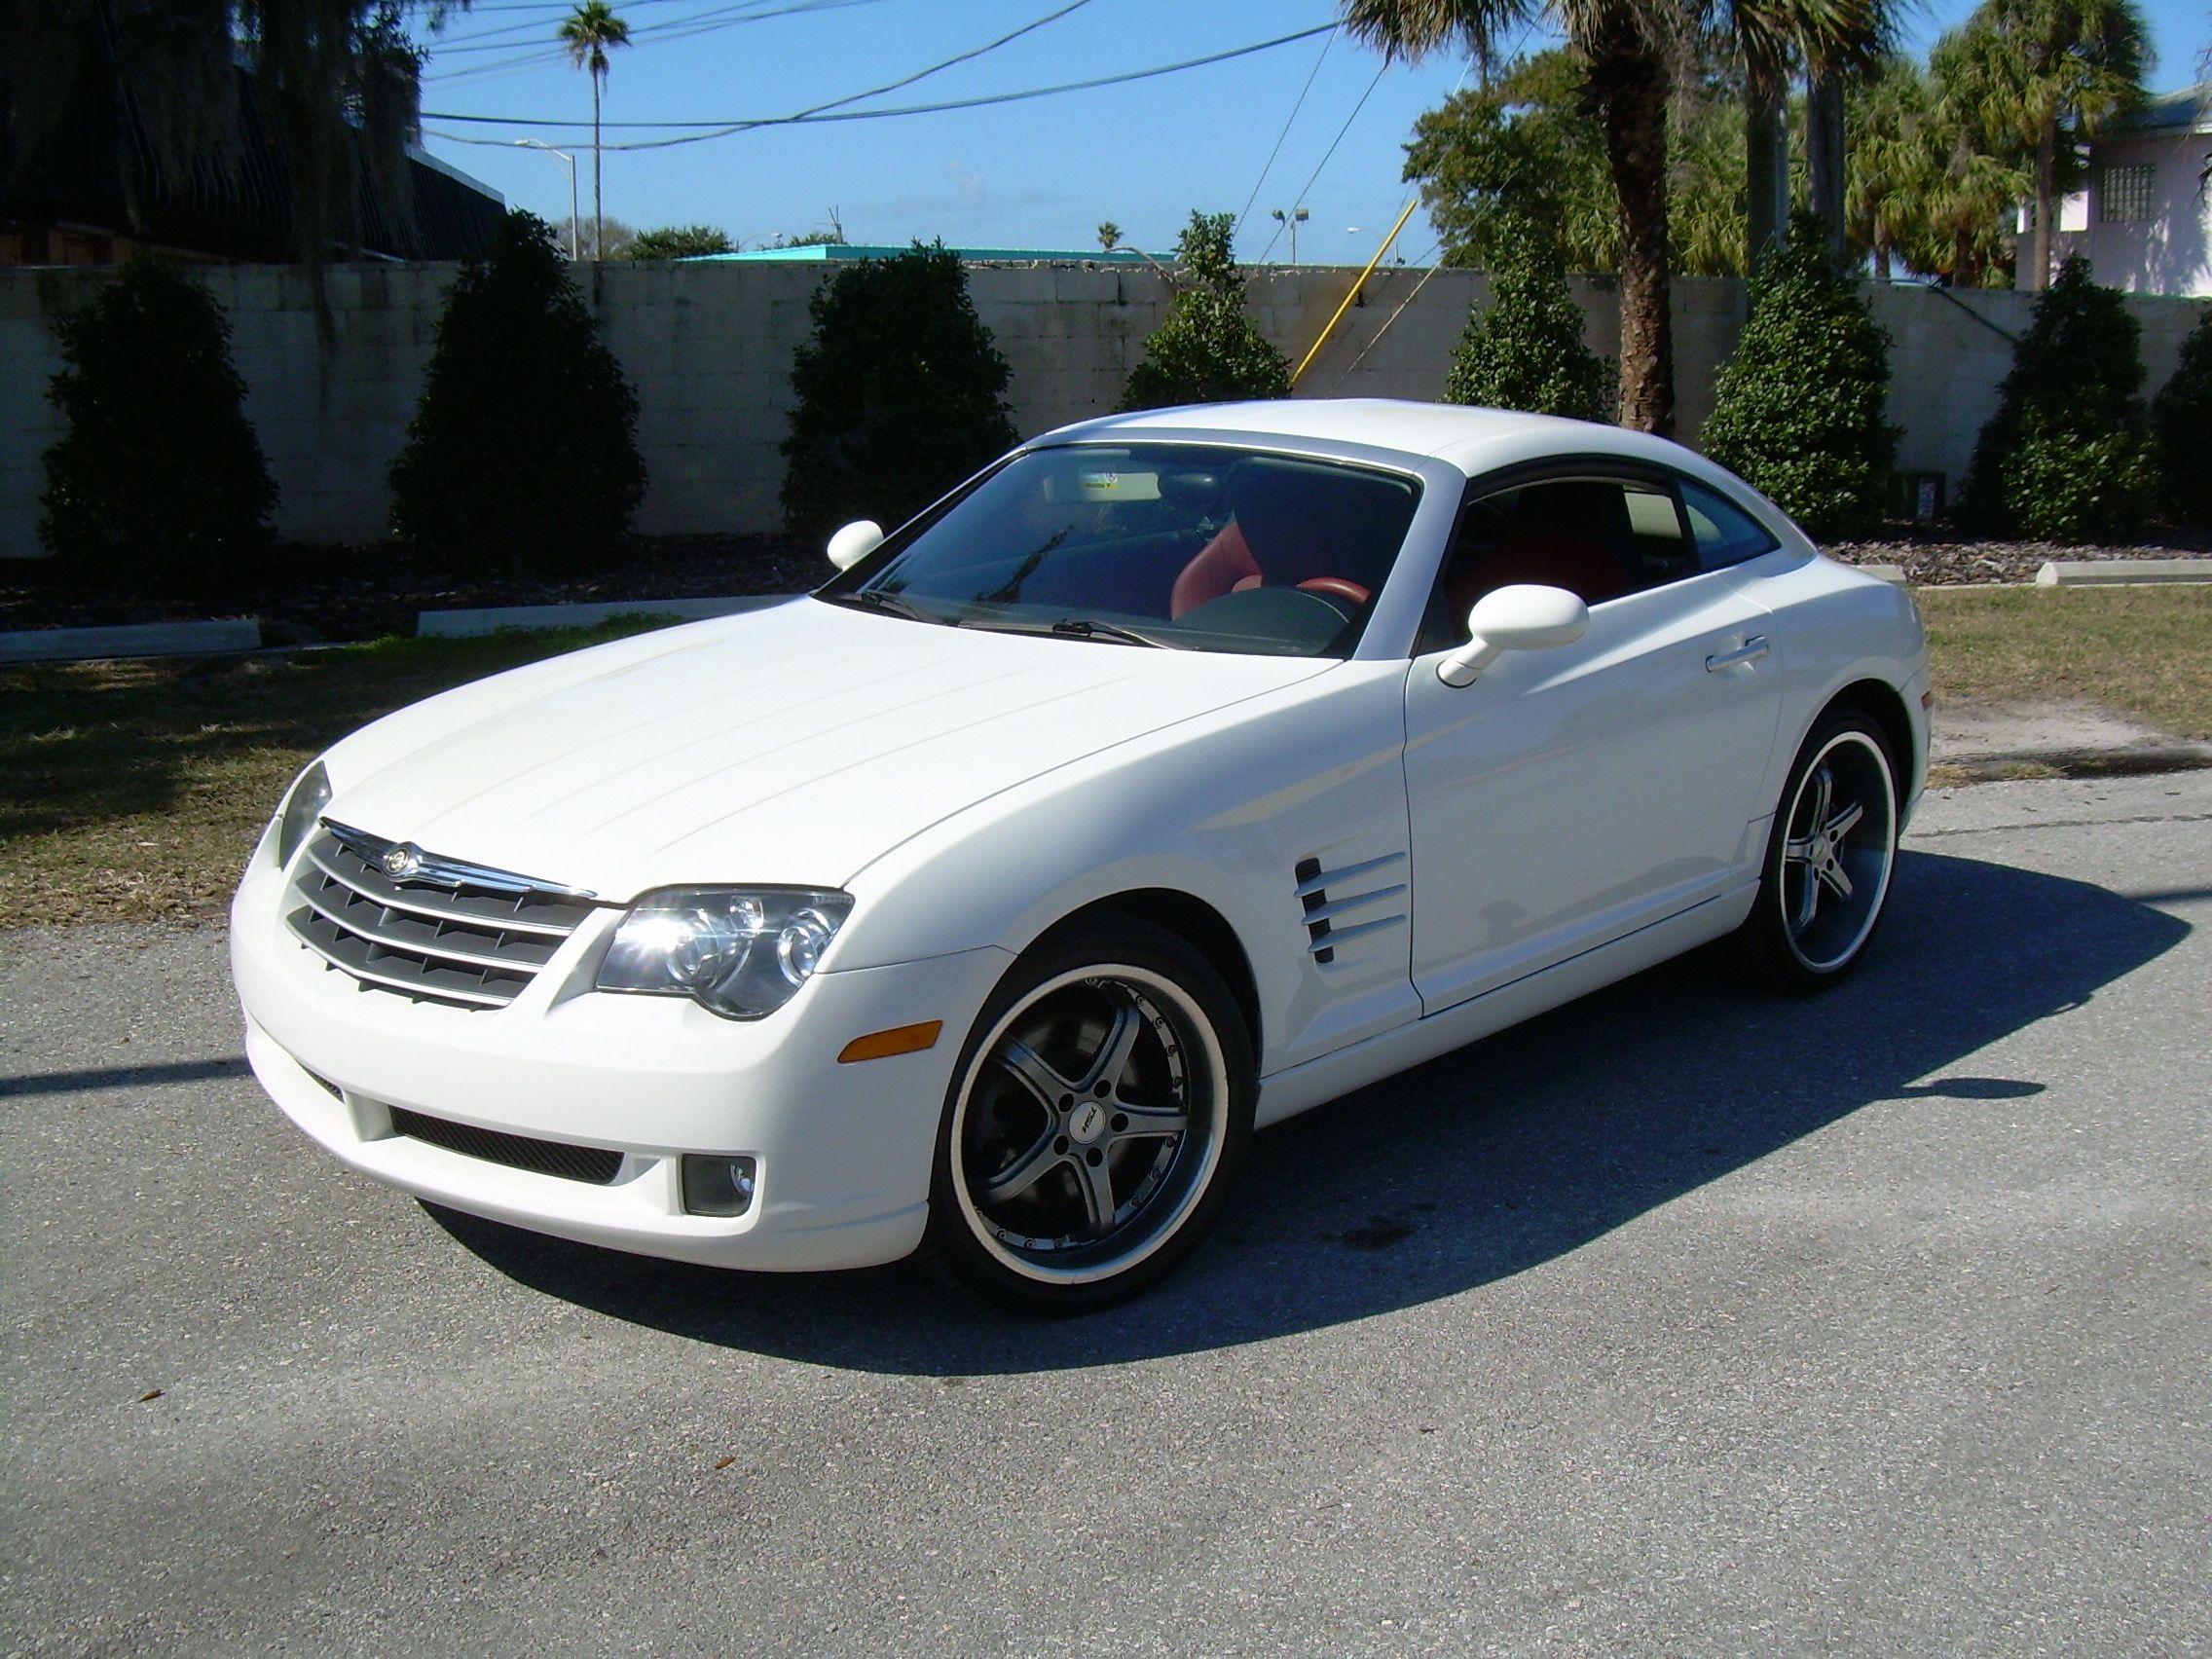 Chrysler Crossfire White 3 Chrysler Crossfire Chrysler Crossfire